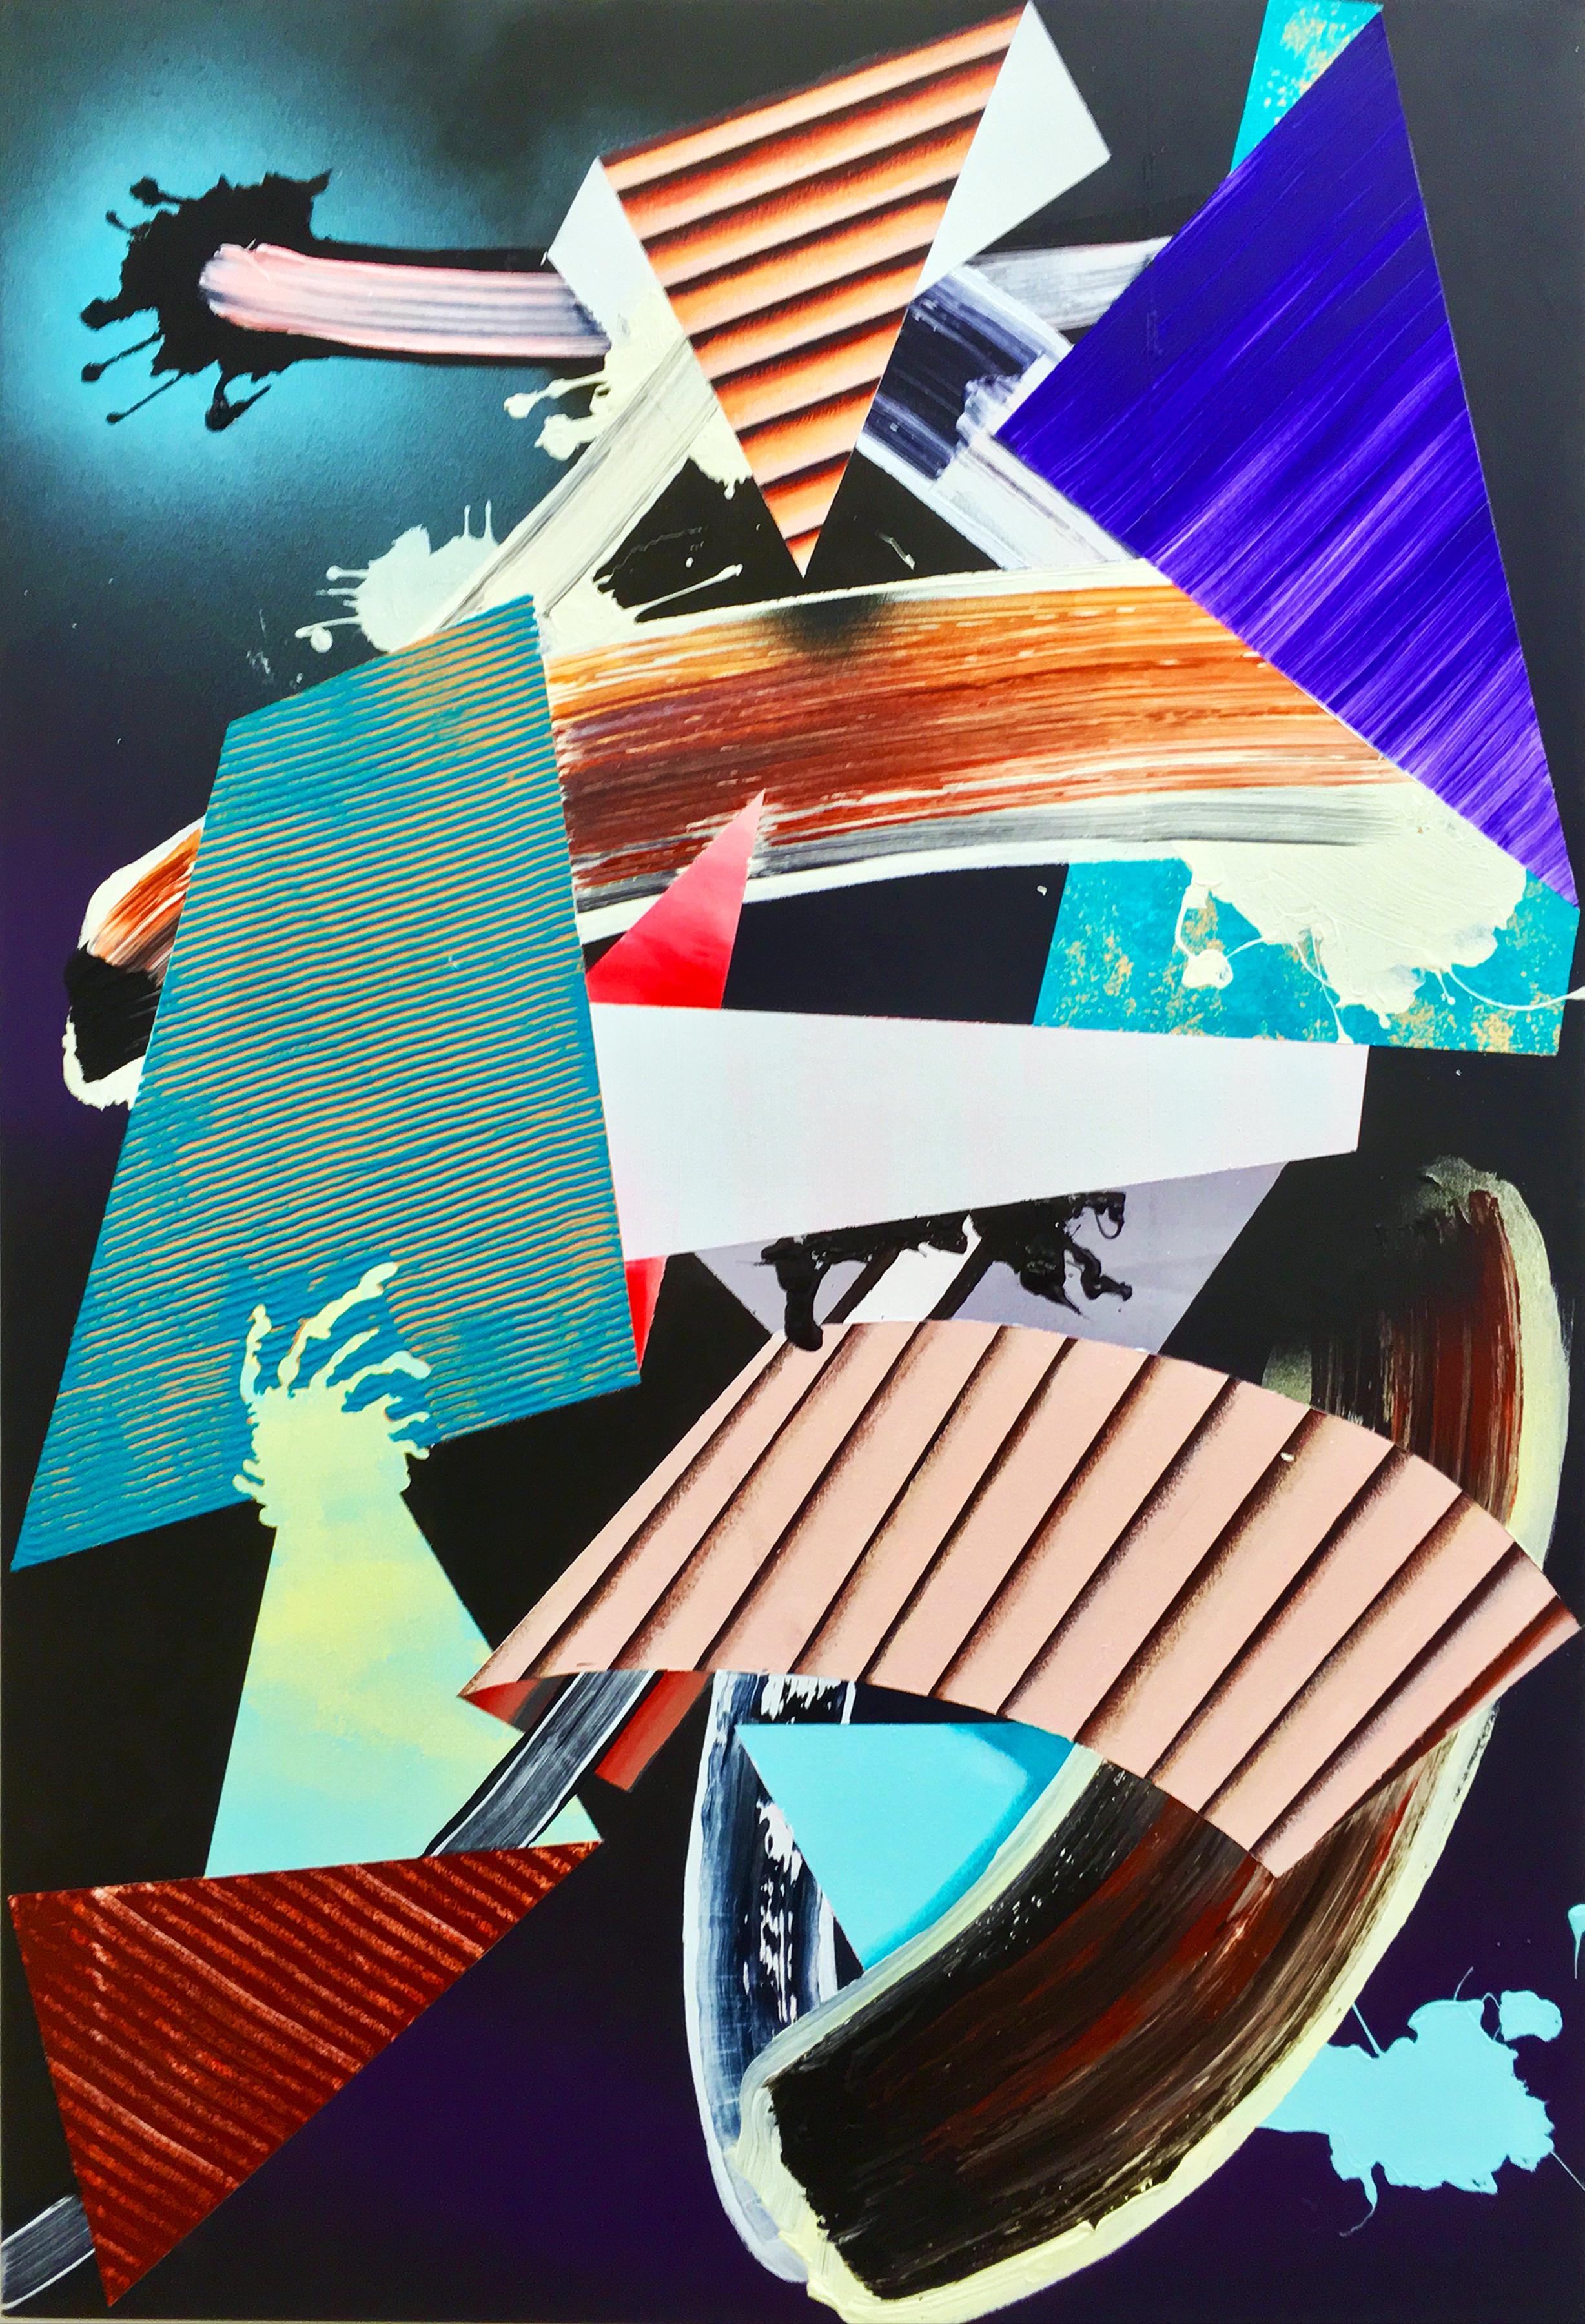 MattSheridan_LetsWork_Painting_50x34__2017_$2750.jpg